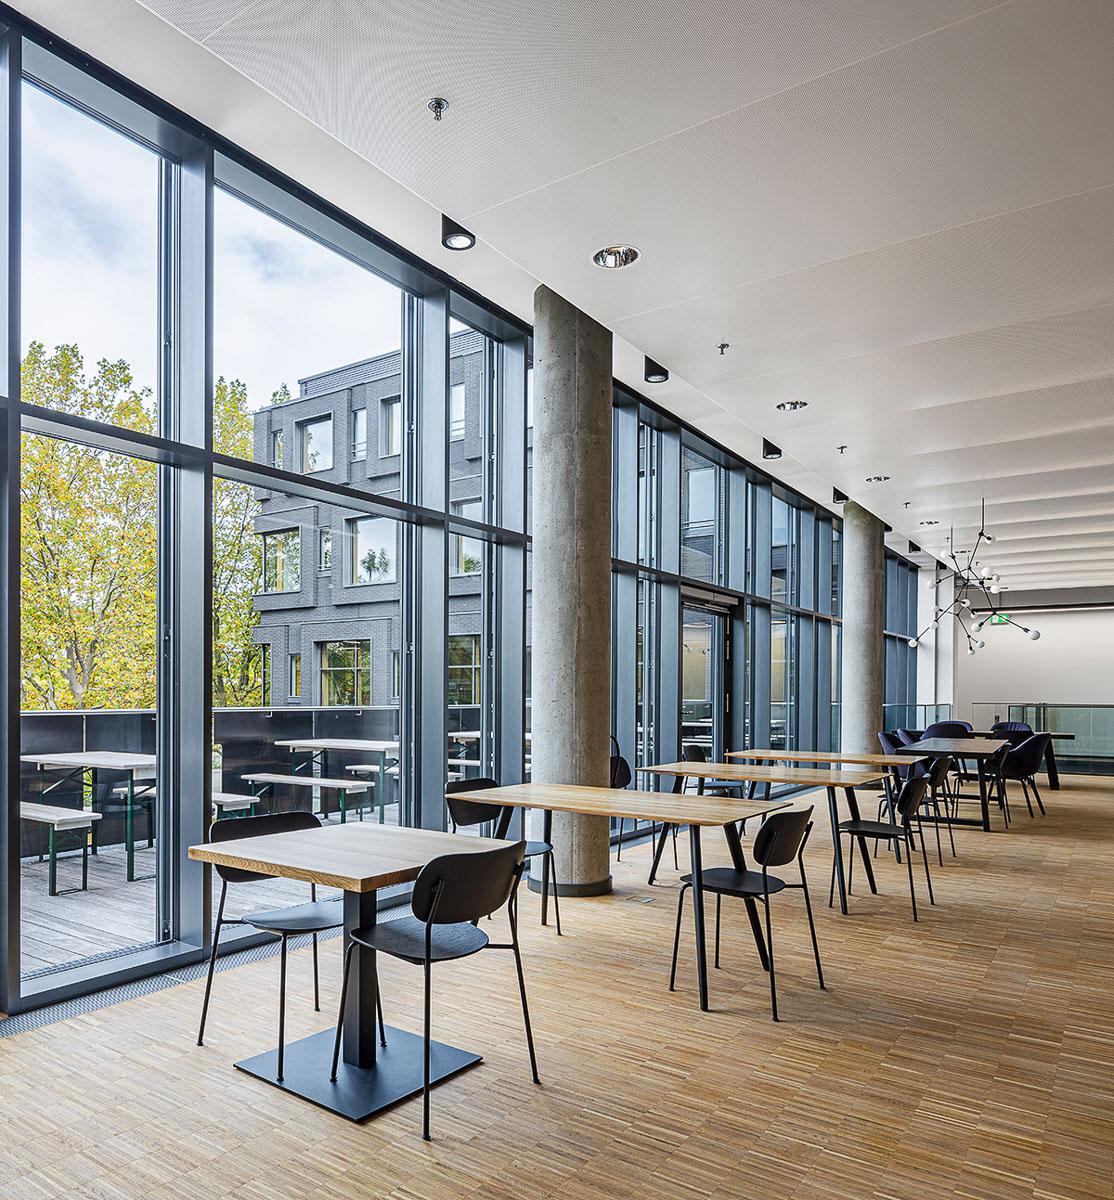 Cafetaria Arri in München